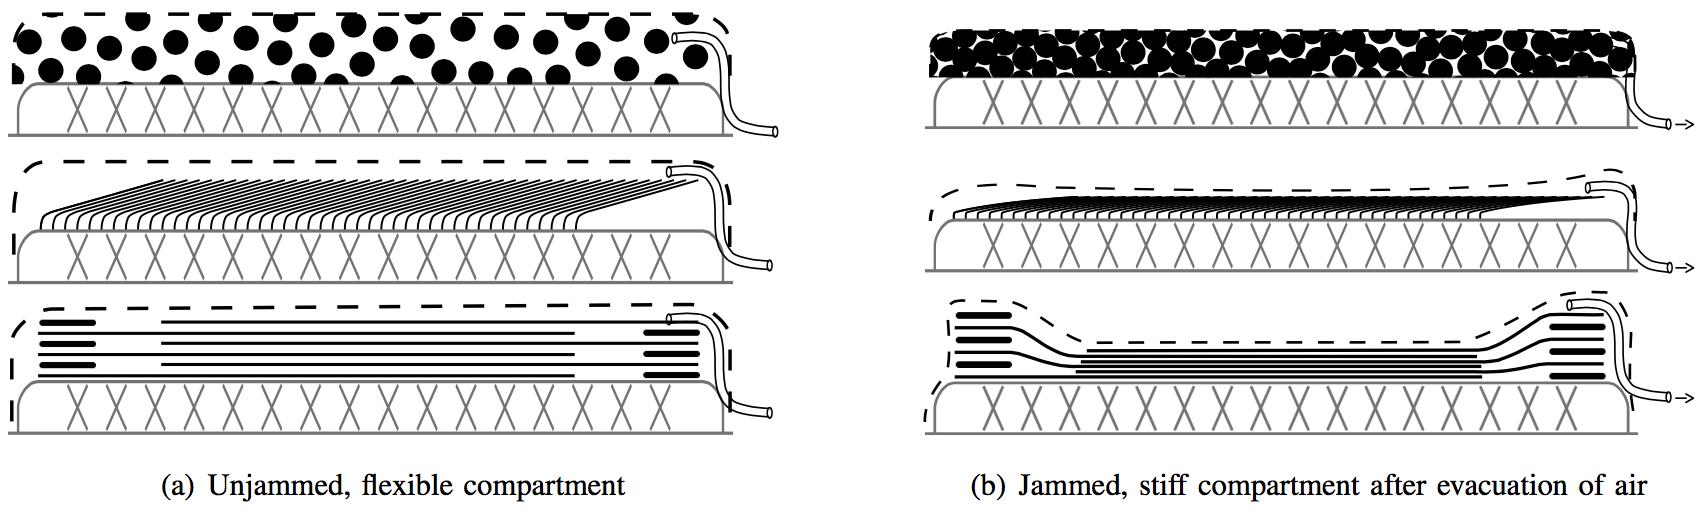 Ilustracja jammingu, źródło http://spectrum.ieee.org/automaton/robotics/robotics-hardware/soft-actuators-go-from-squishy-to-stiff-and-back-again